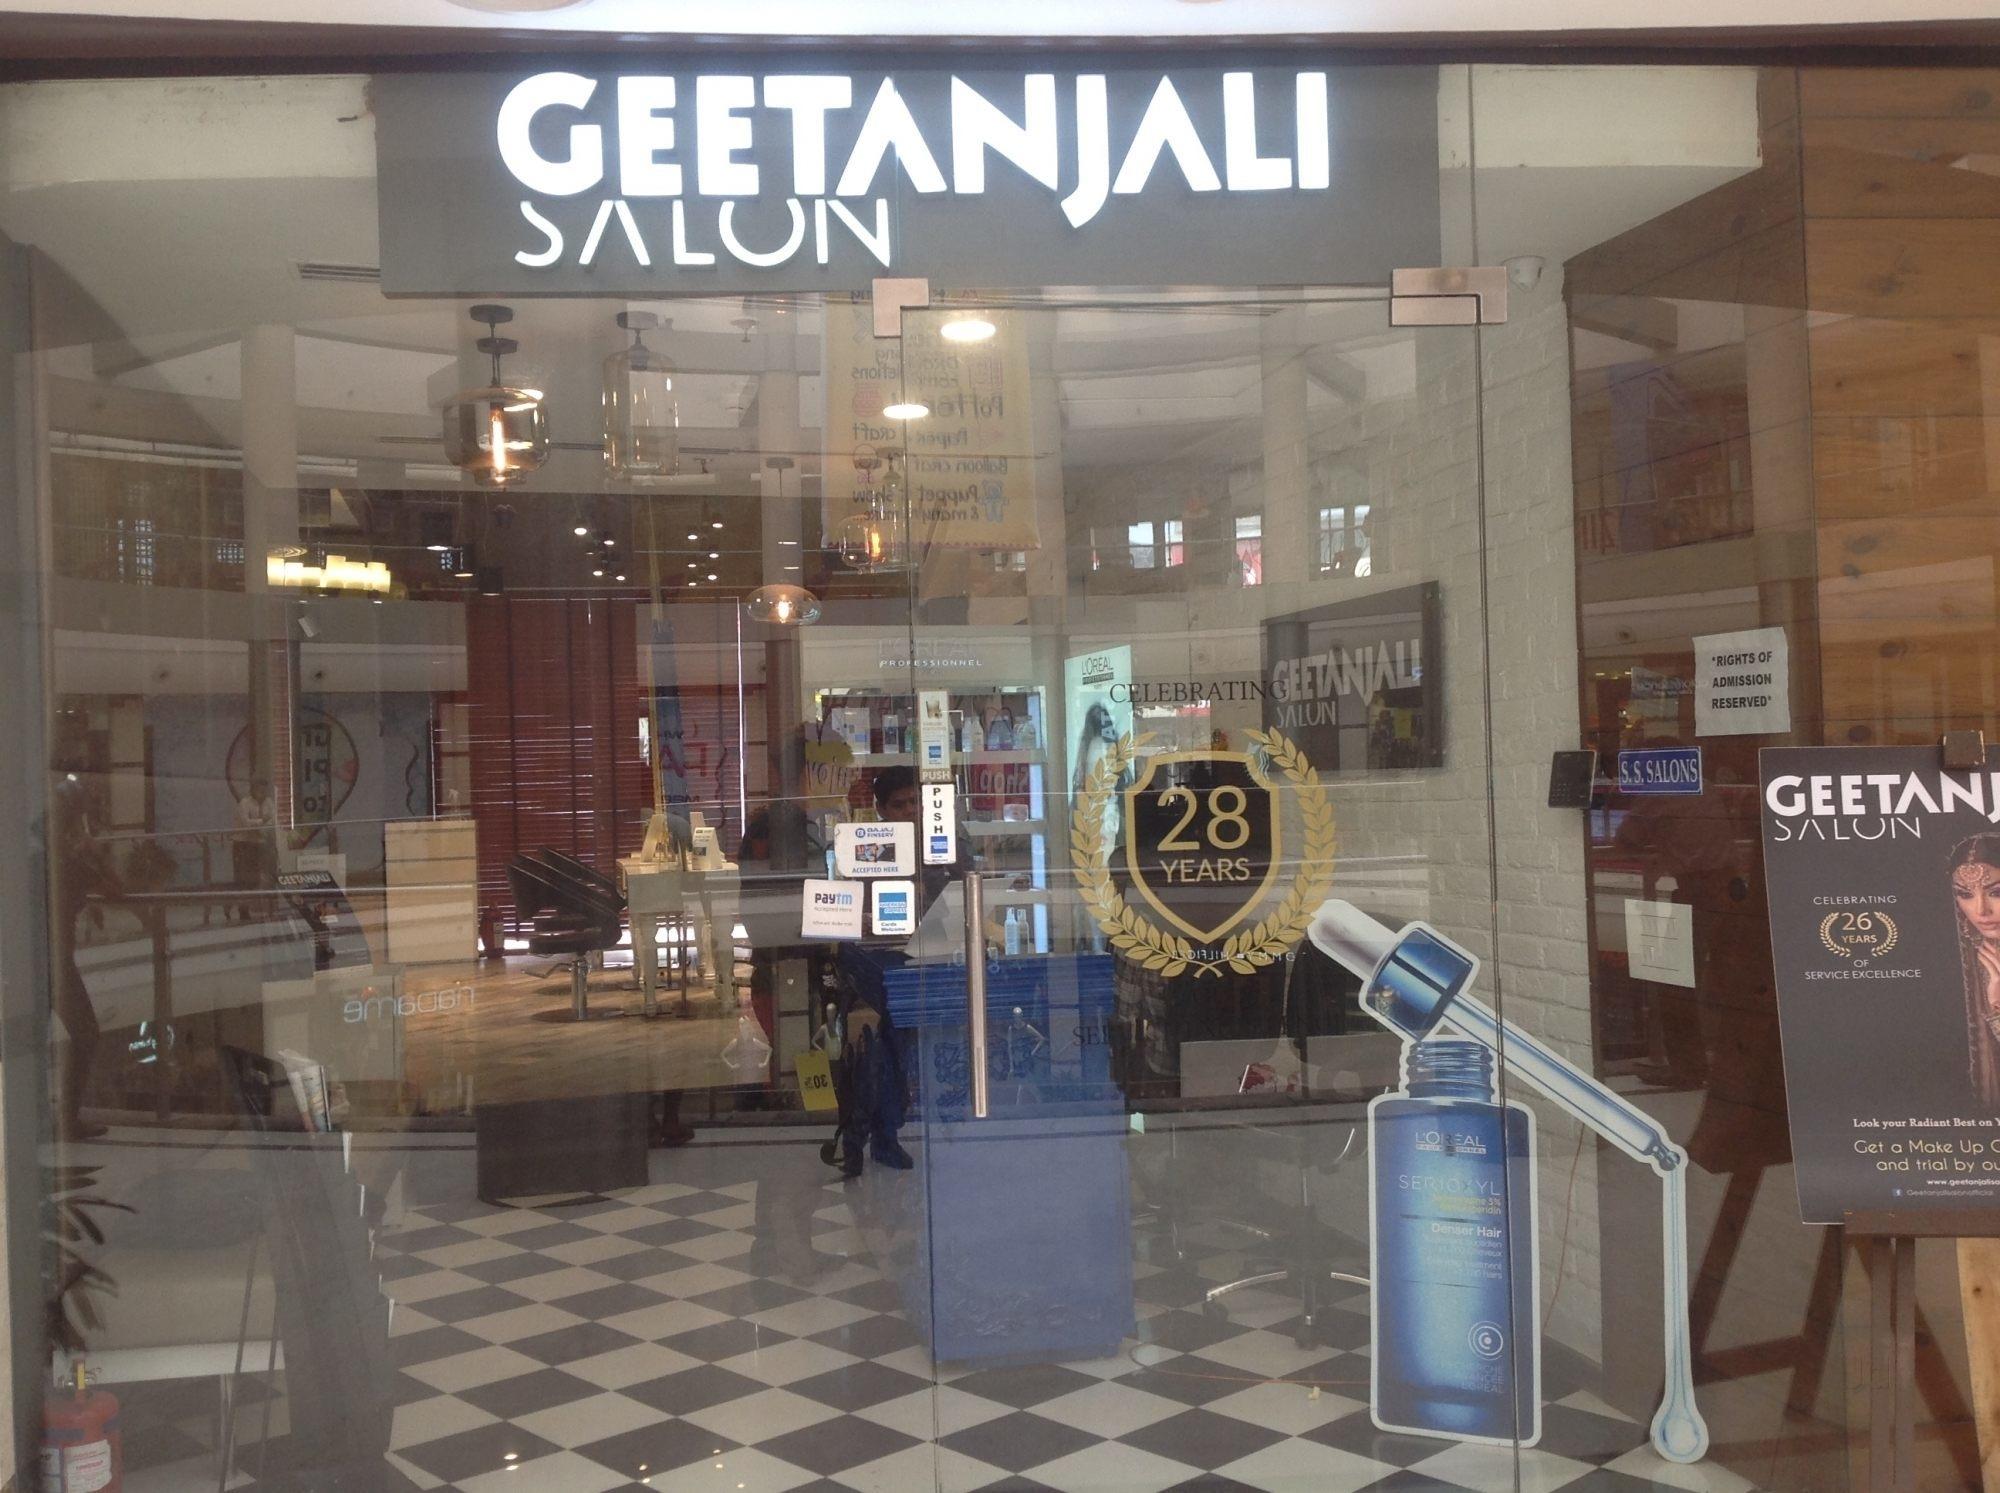 Geetanjali Salon Photos, Kamla Nagar, Delhi- Pictures & Images with Haircut Salon In Kamla Nagar